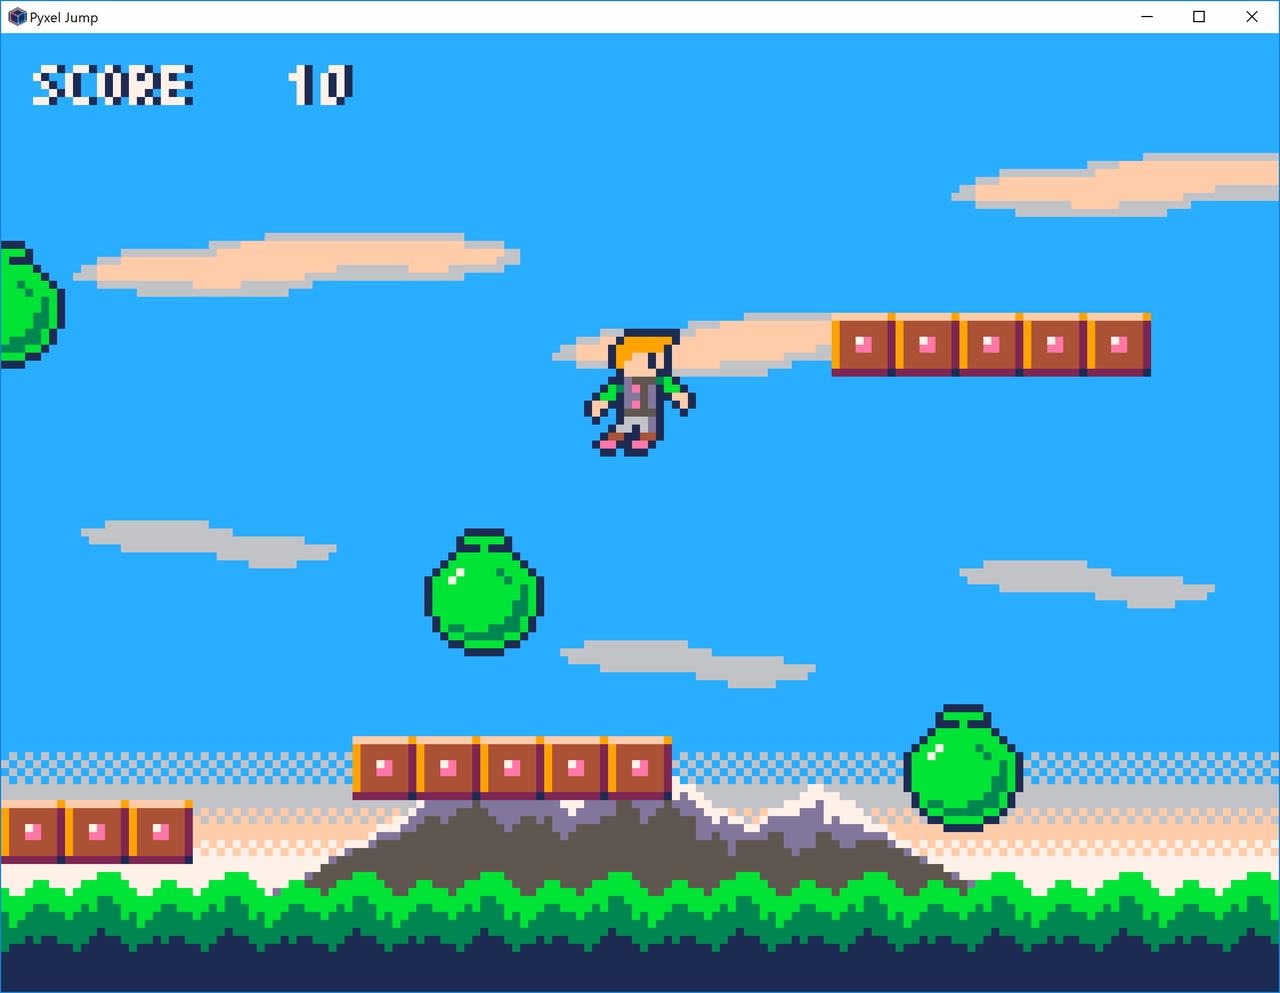 02_jump_game